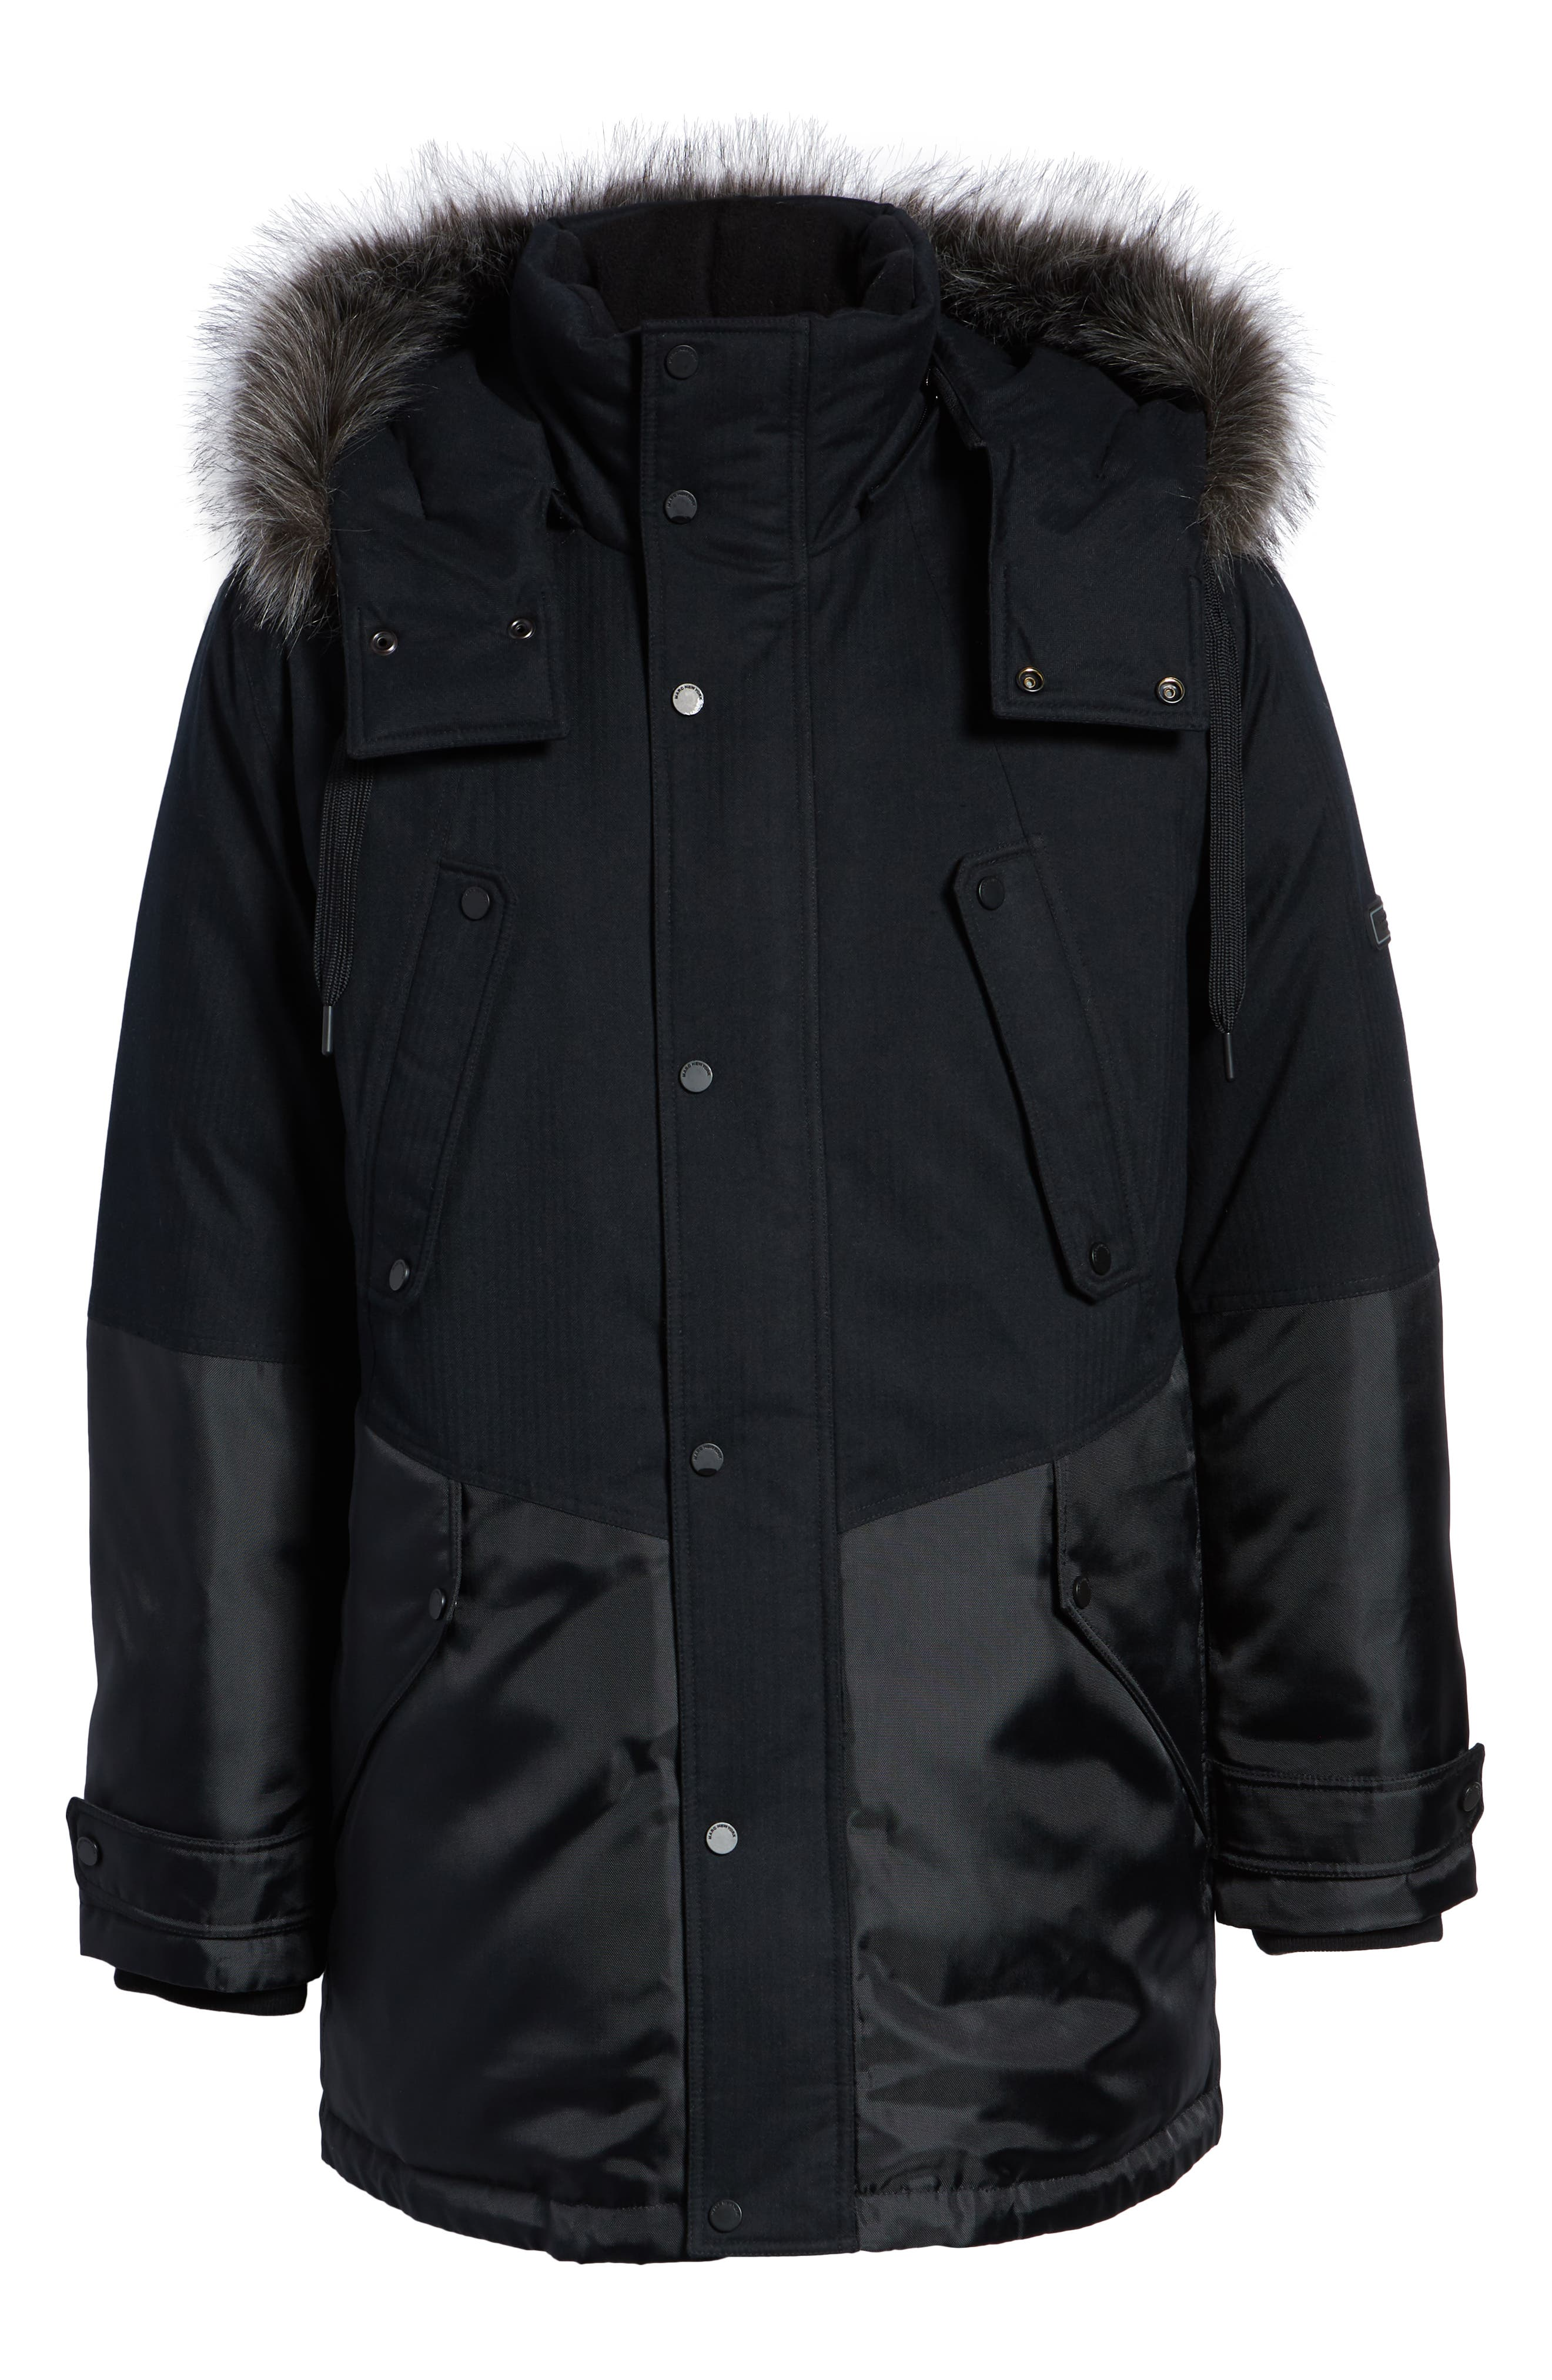 MARC NEW YORK, Maxfield Faux Fur Trim Parka, Alternate thumbnail 6, color, BLACK